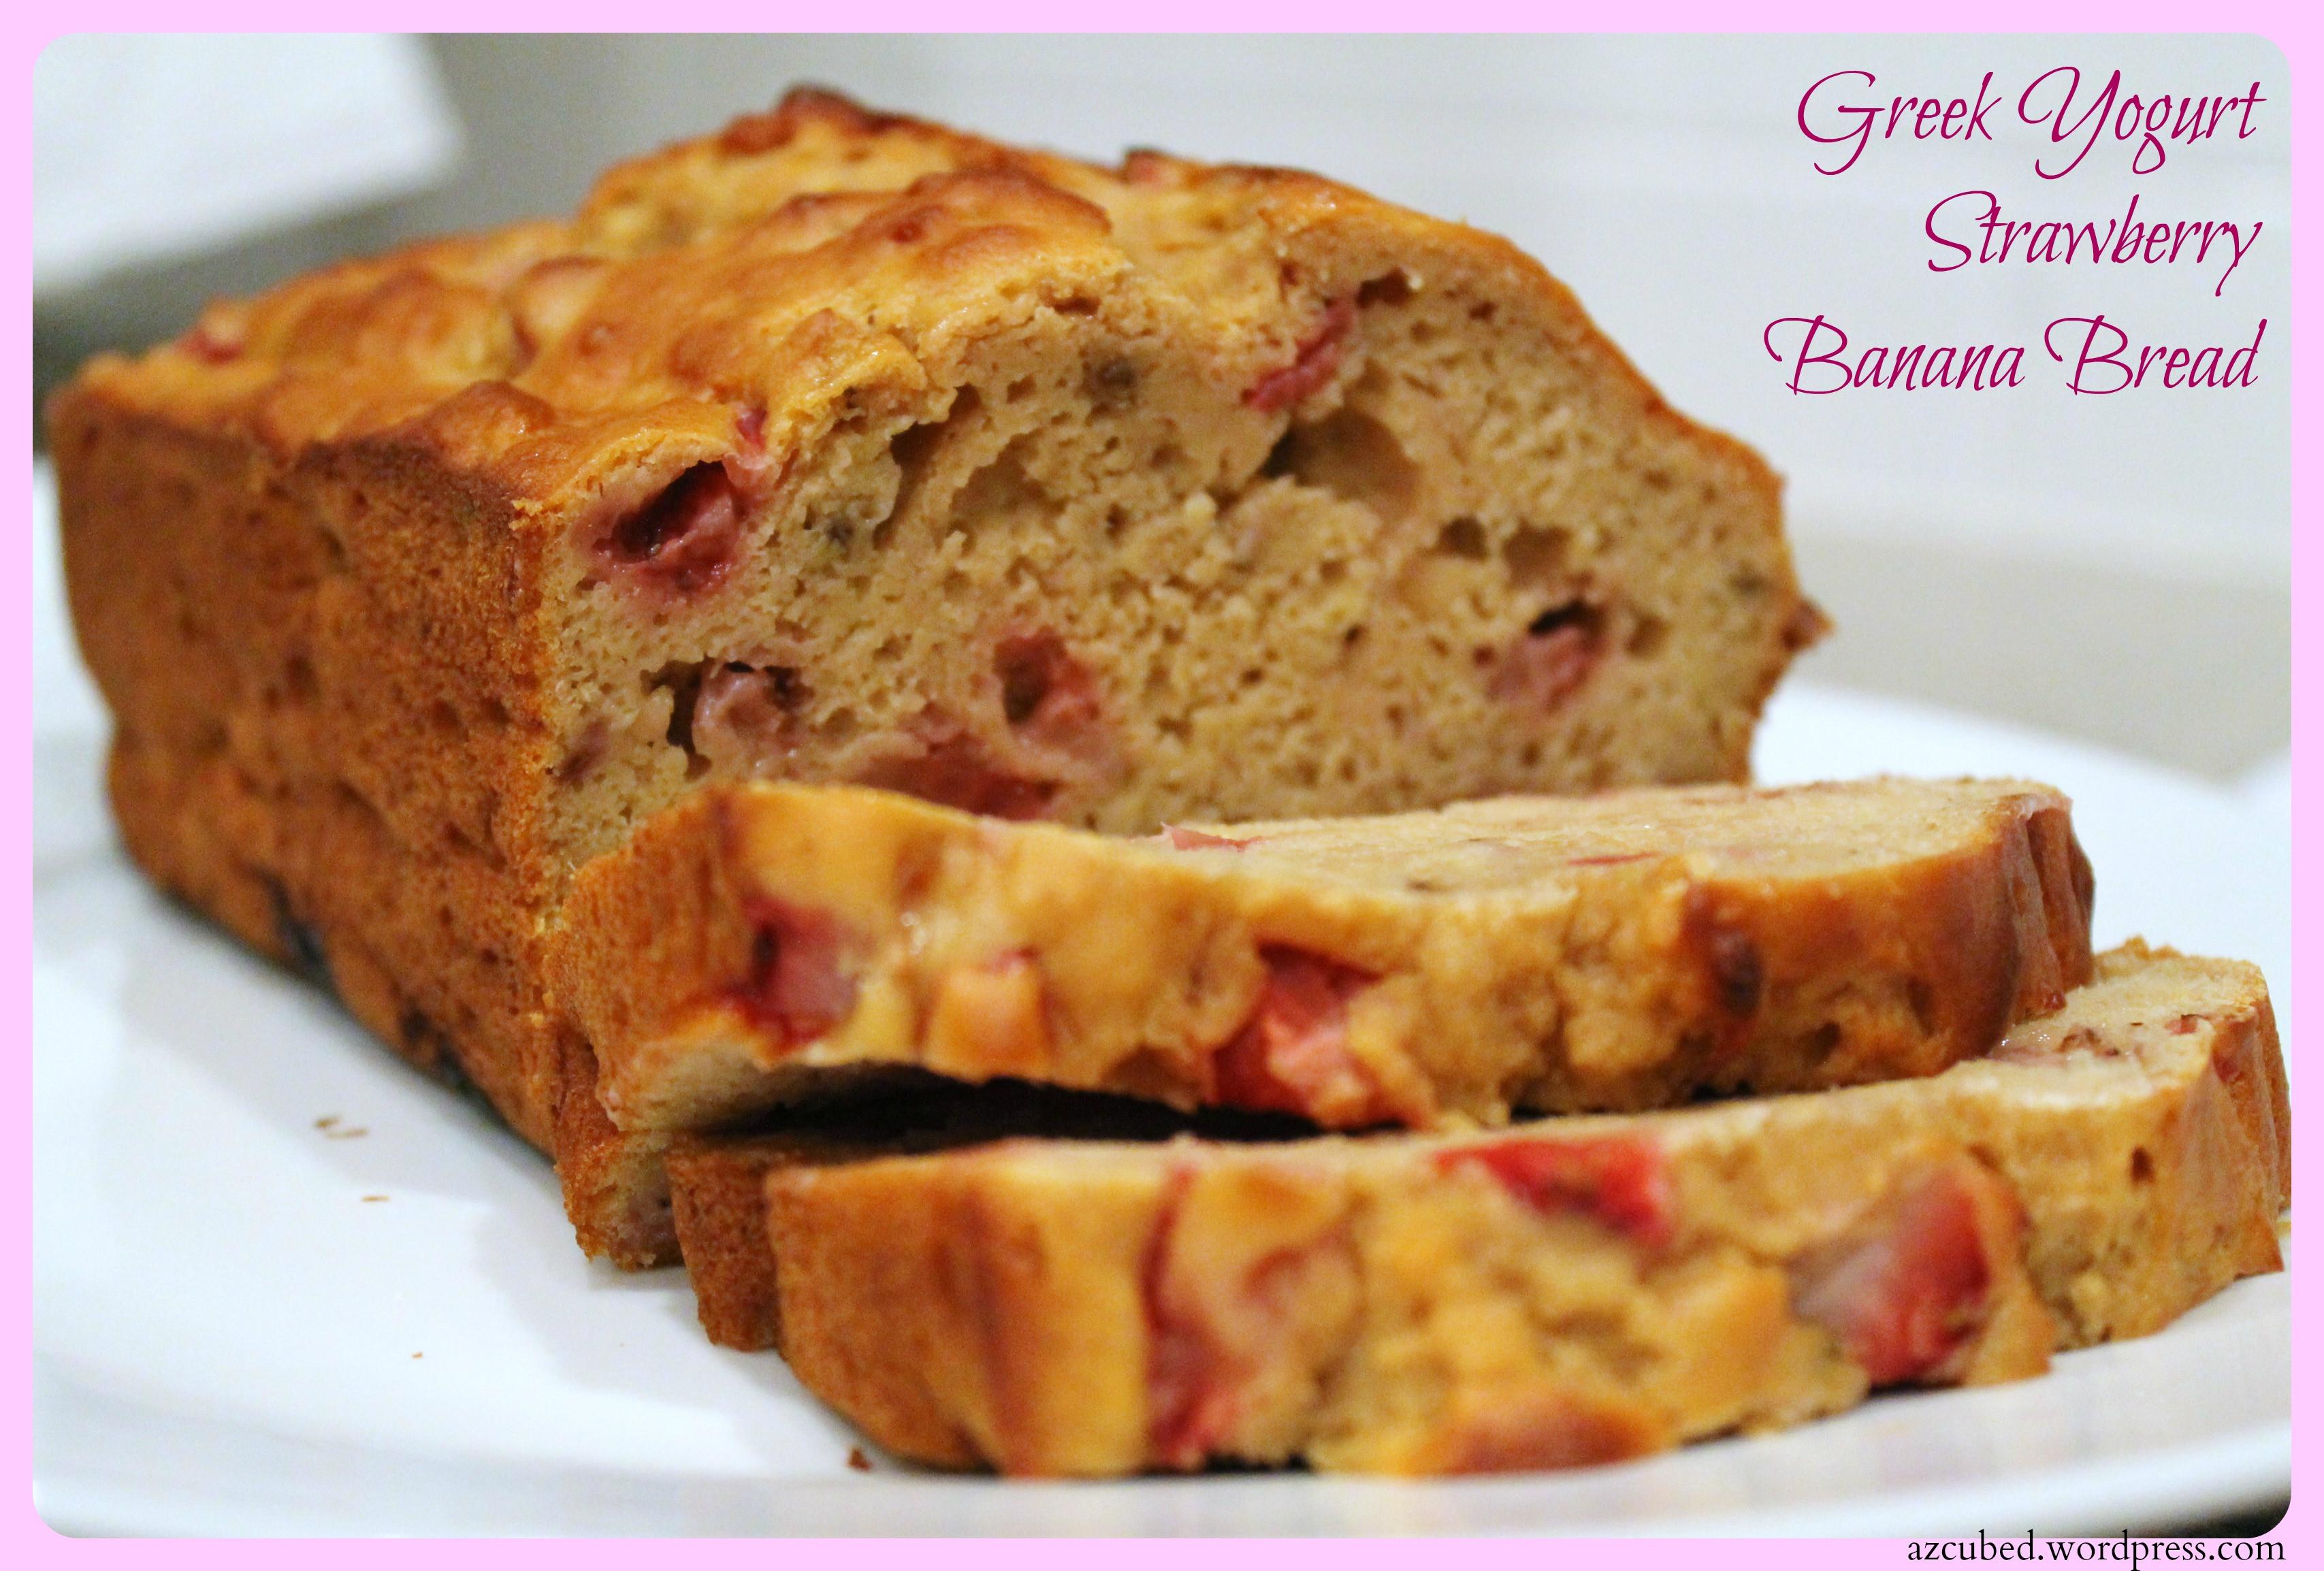 Healthy Banana Bread With Yogurt  Greek Yogurt Strawberry Banana Bread Healthy & Delicious